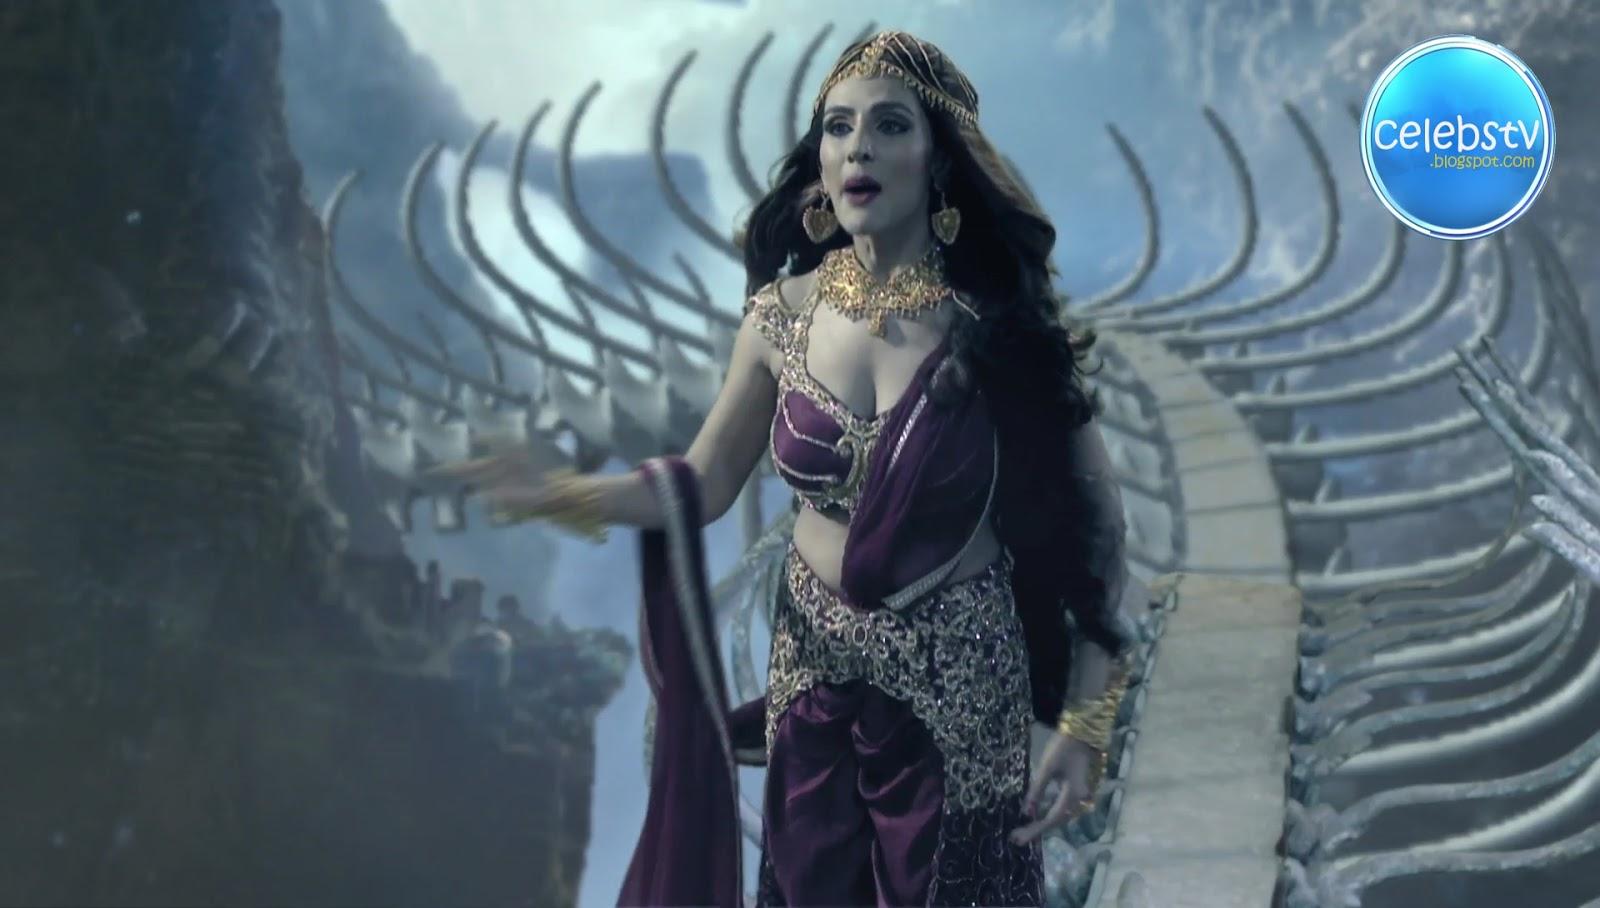 Sudeepa Singh Aka Rani Pari Very Hot Sexy Deep Cleavage -4678